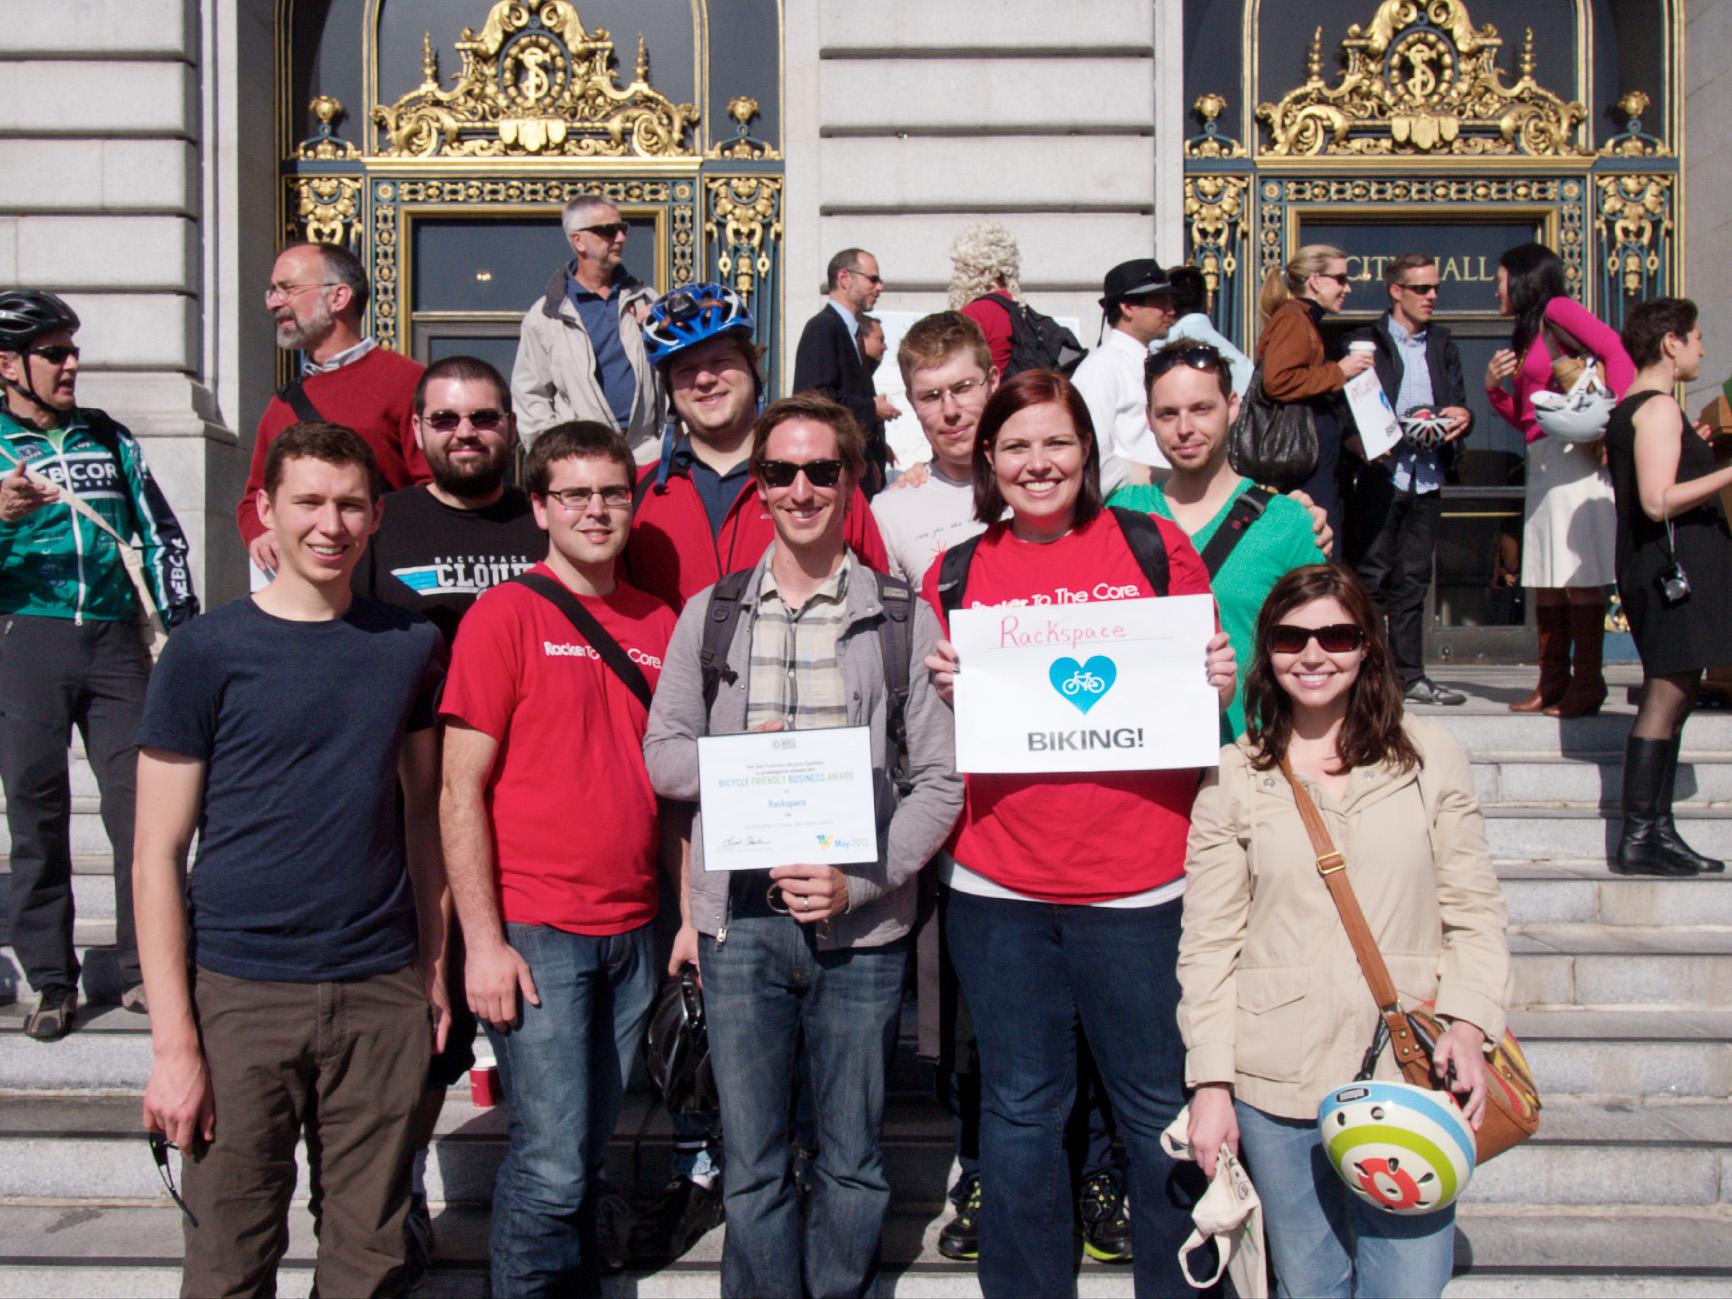 san francisco rackspace office. San Francisco Rackers Celebrate Bike To Work Day Rackspace Office